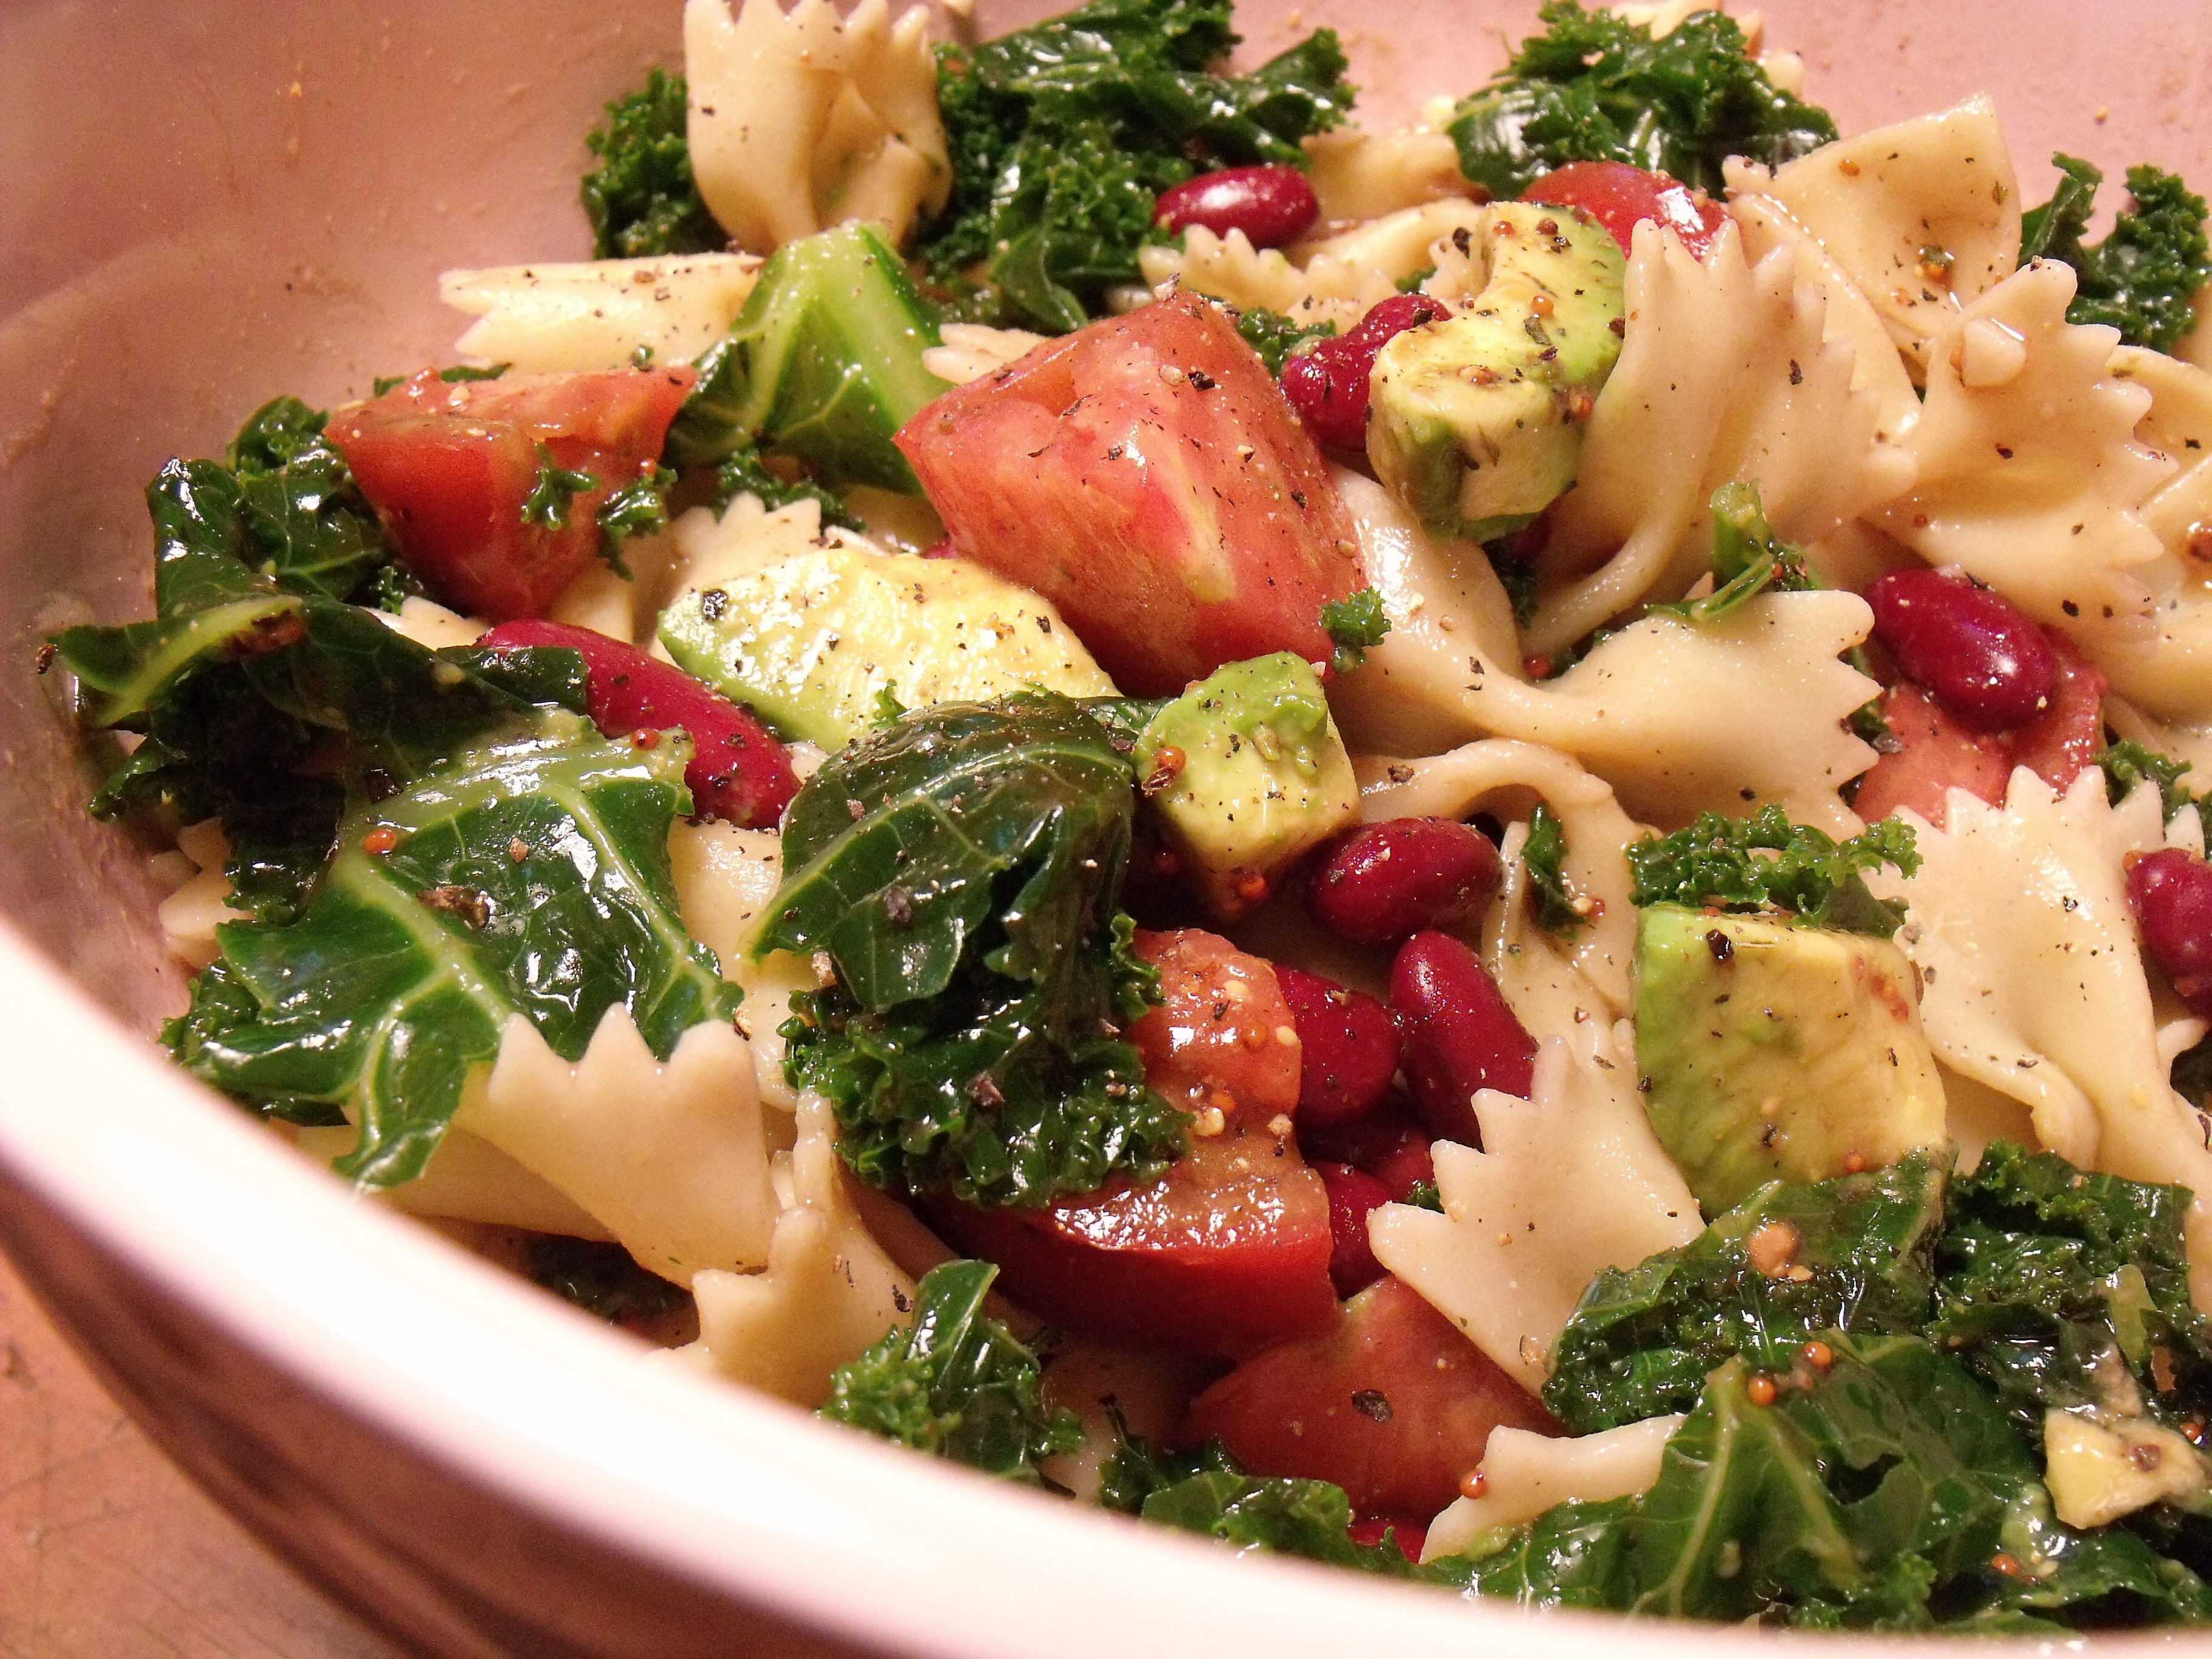 Healthy Vegan Pasta Recipes  Quick Cheap & Healthy Vegan Pasta Salad that s YUMMY